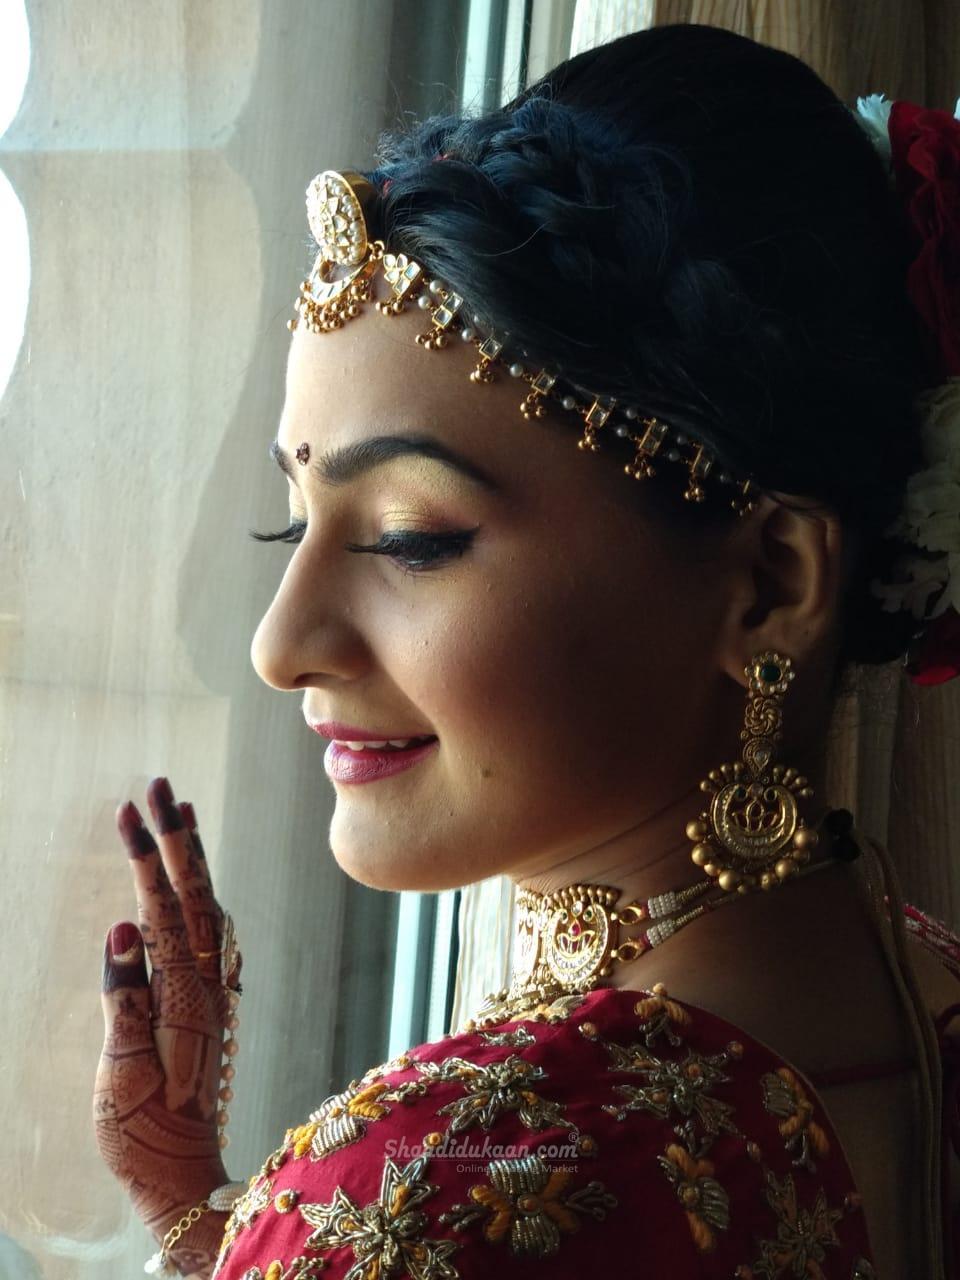 Avinash Kore Makeup Studio & Bollywood Celebrity's  Makeup Artist